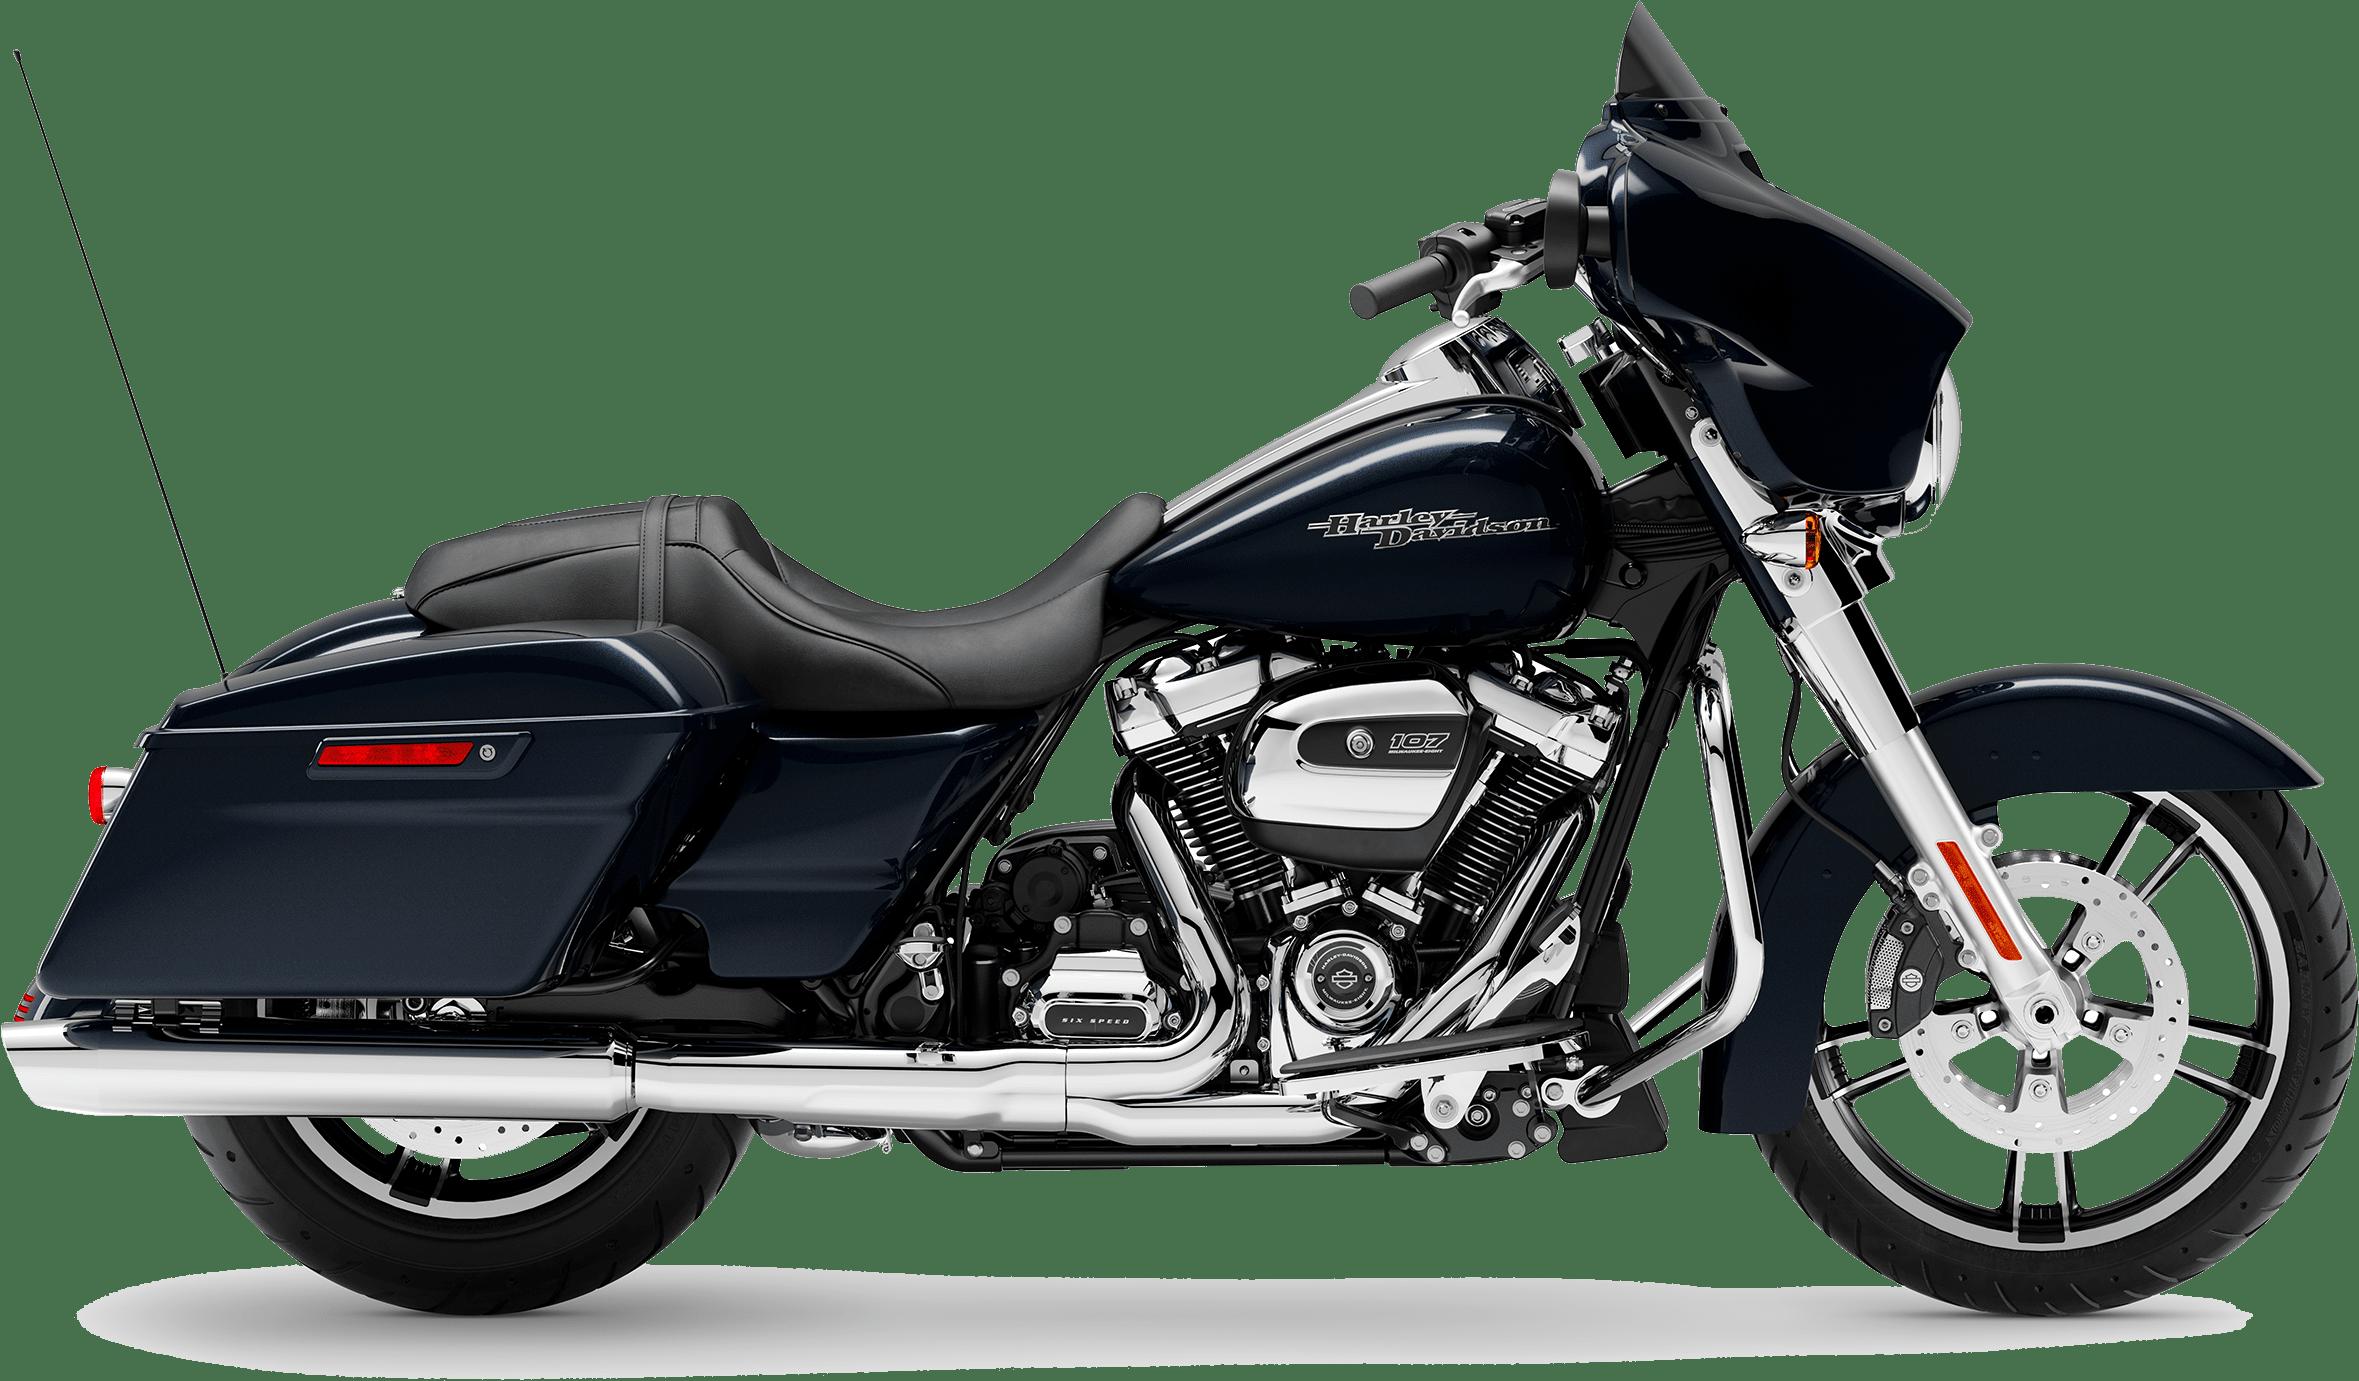 2019 Harley-Davidson H-D Touring Street Glide Midnight Blue